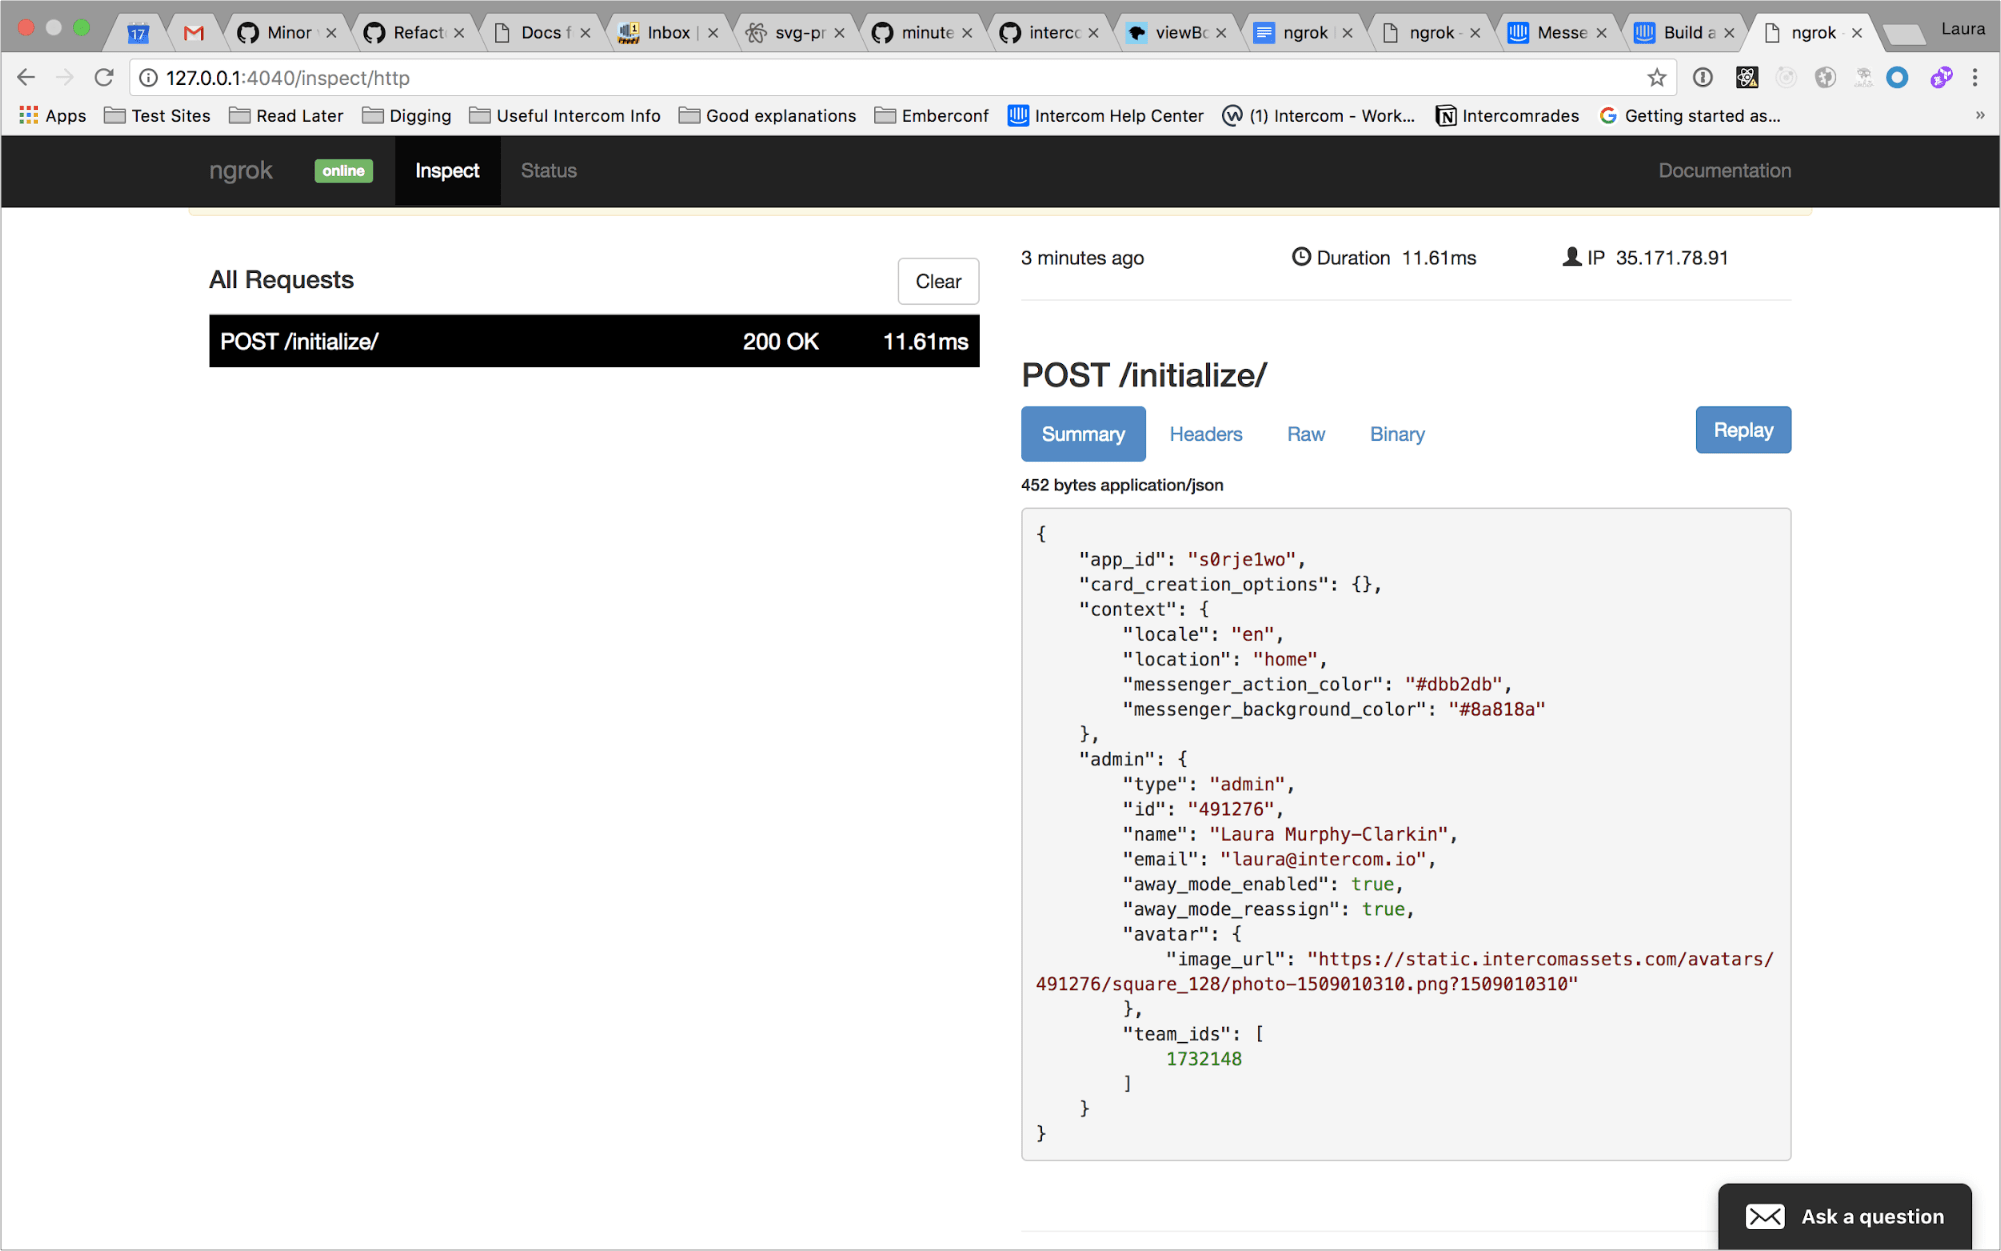 ngrok web interface response